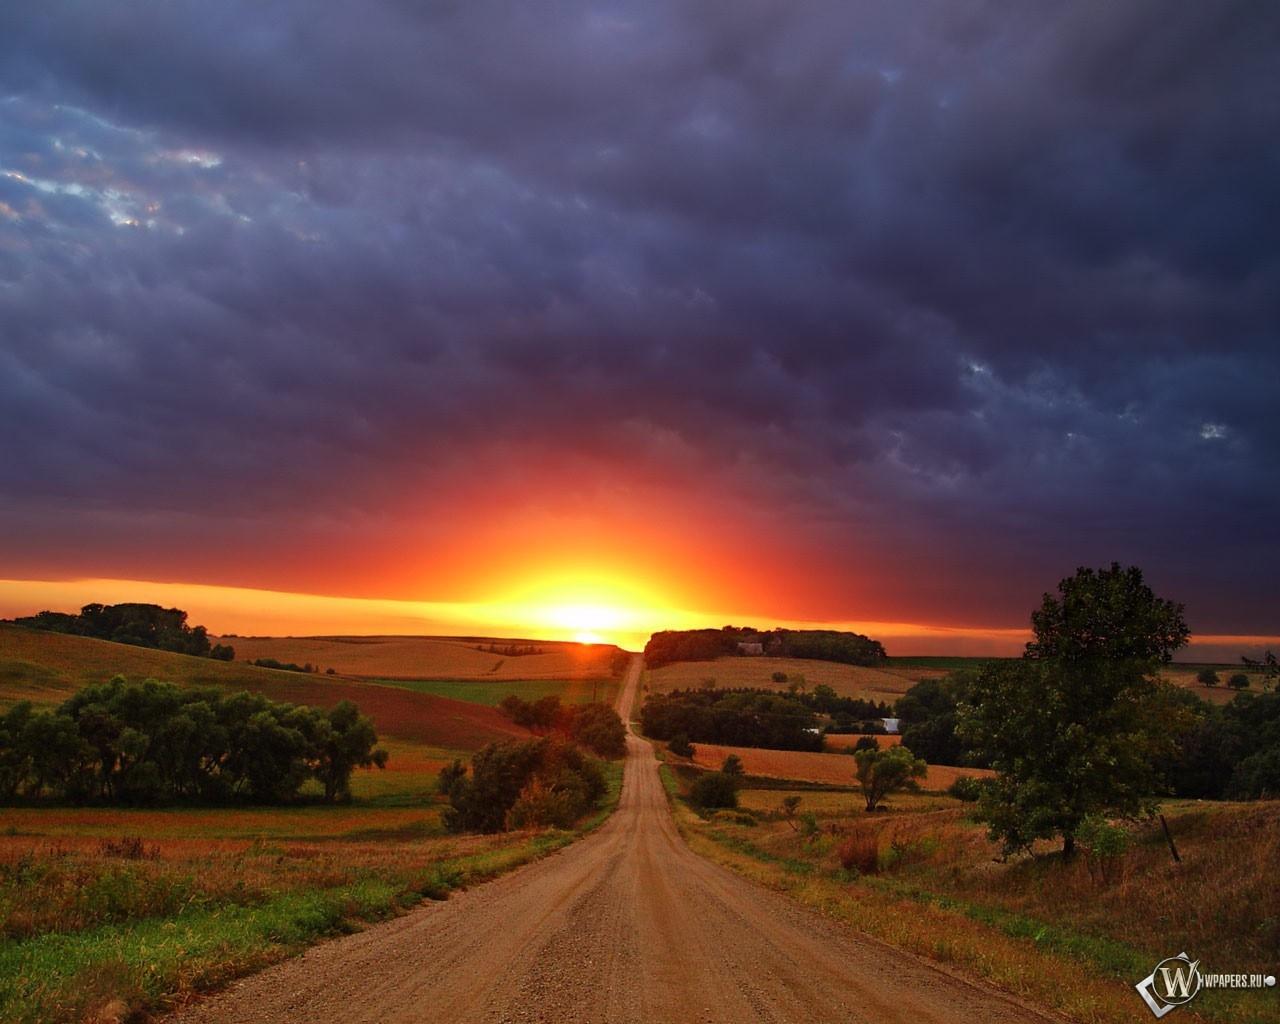 Дорога к солнцу 1280x1024